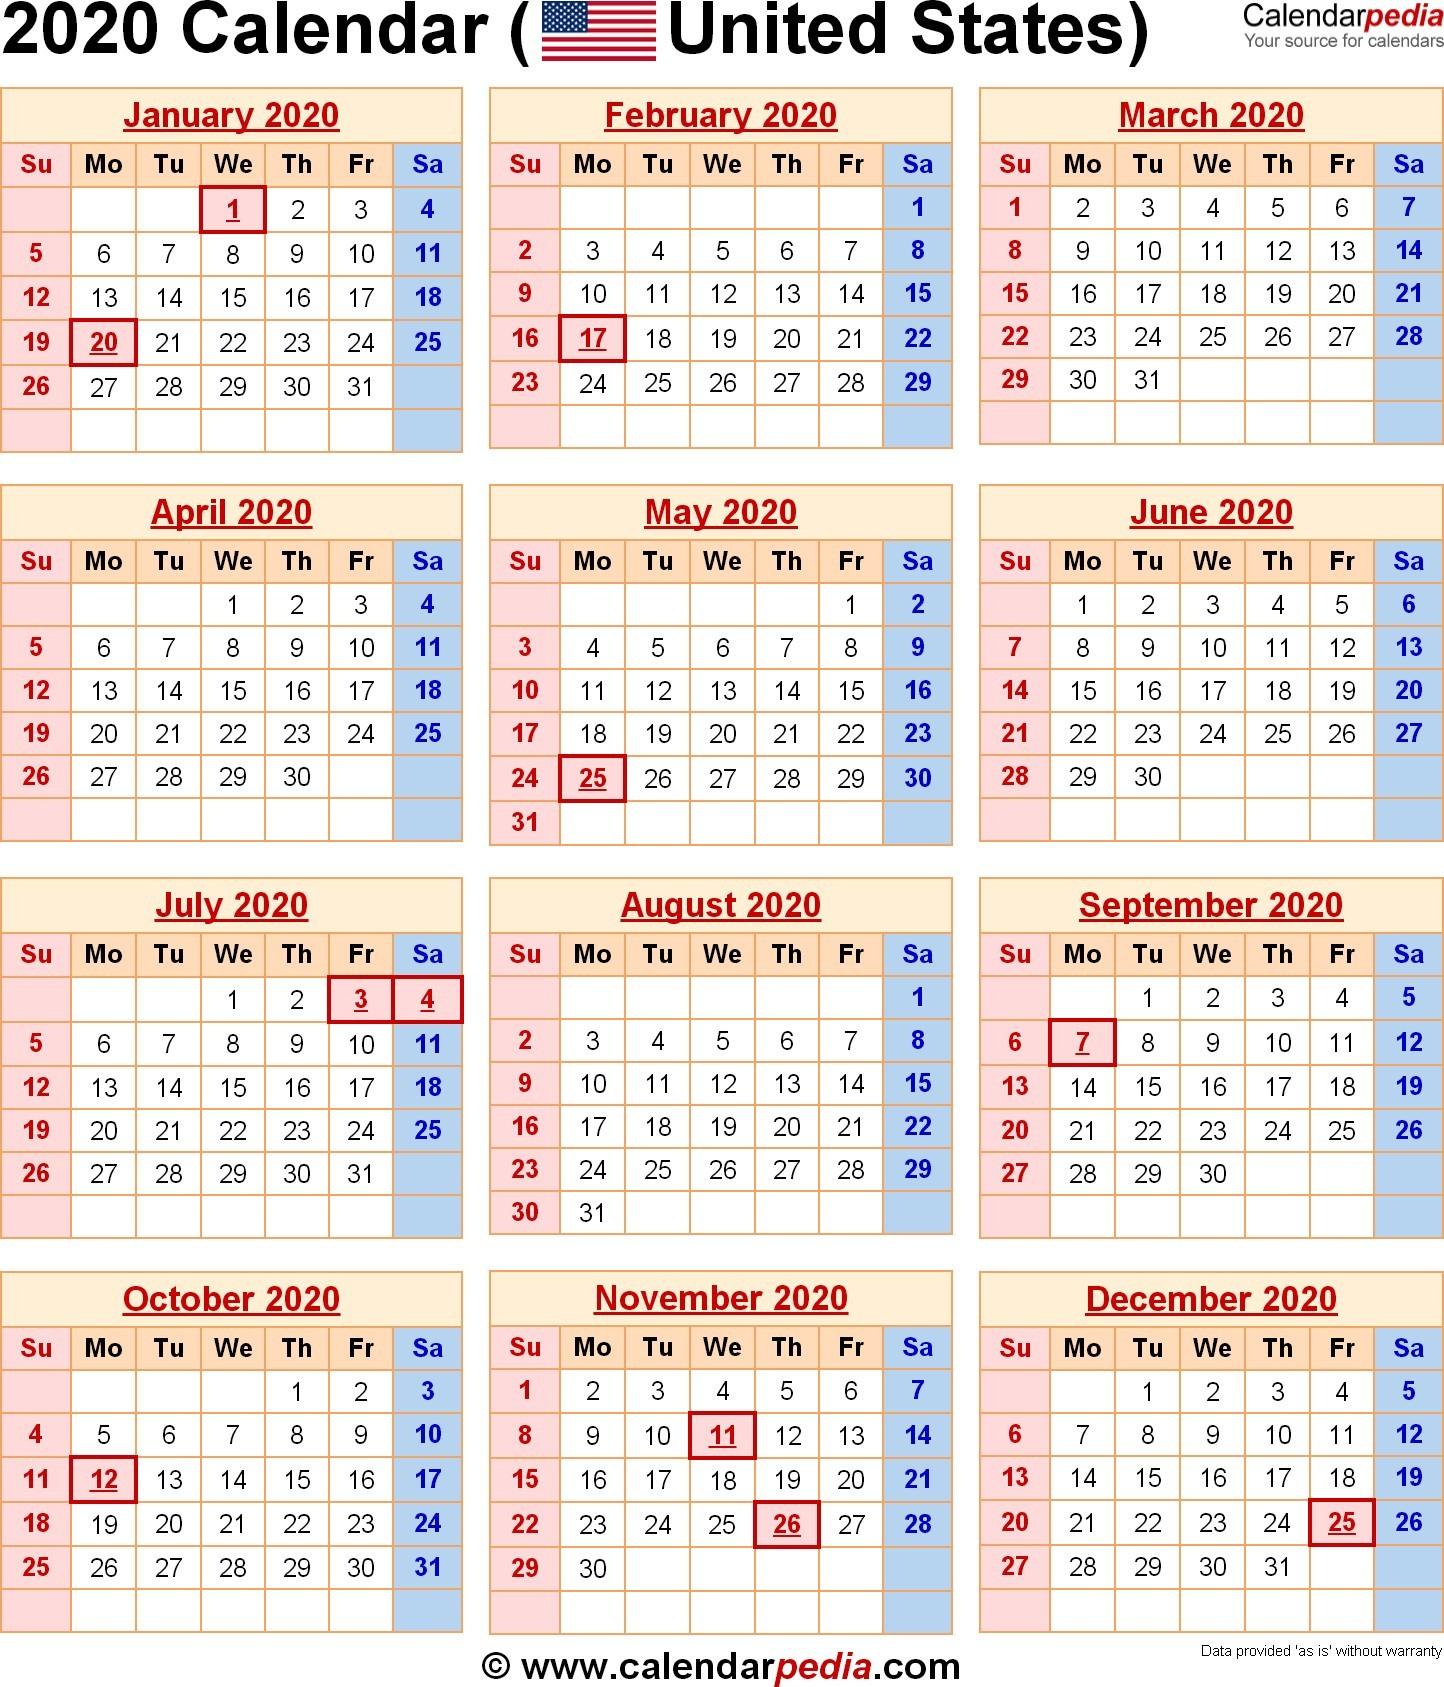 Free Printable Calendars 2020 and 2020